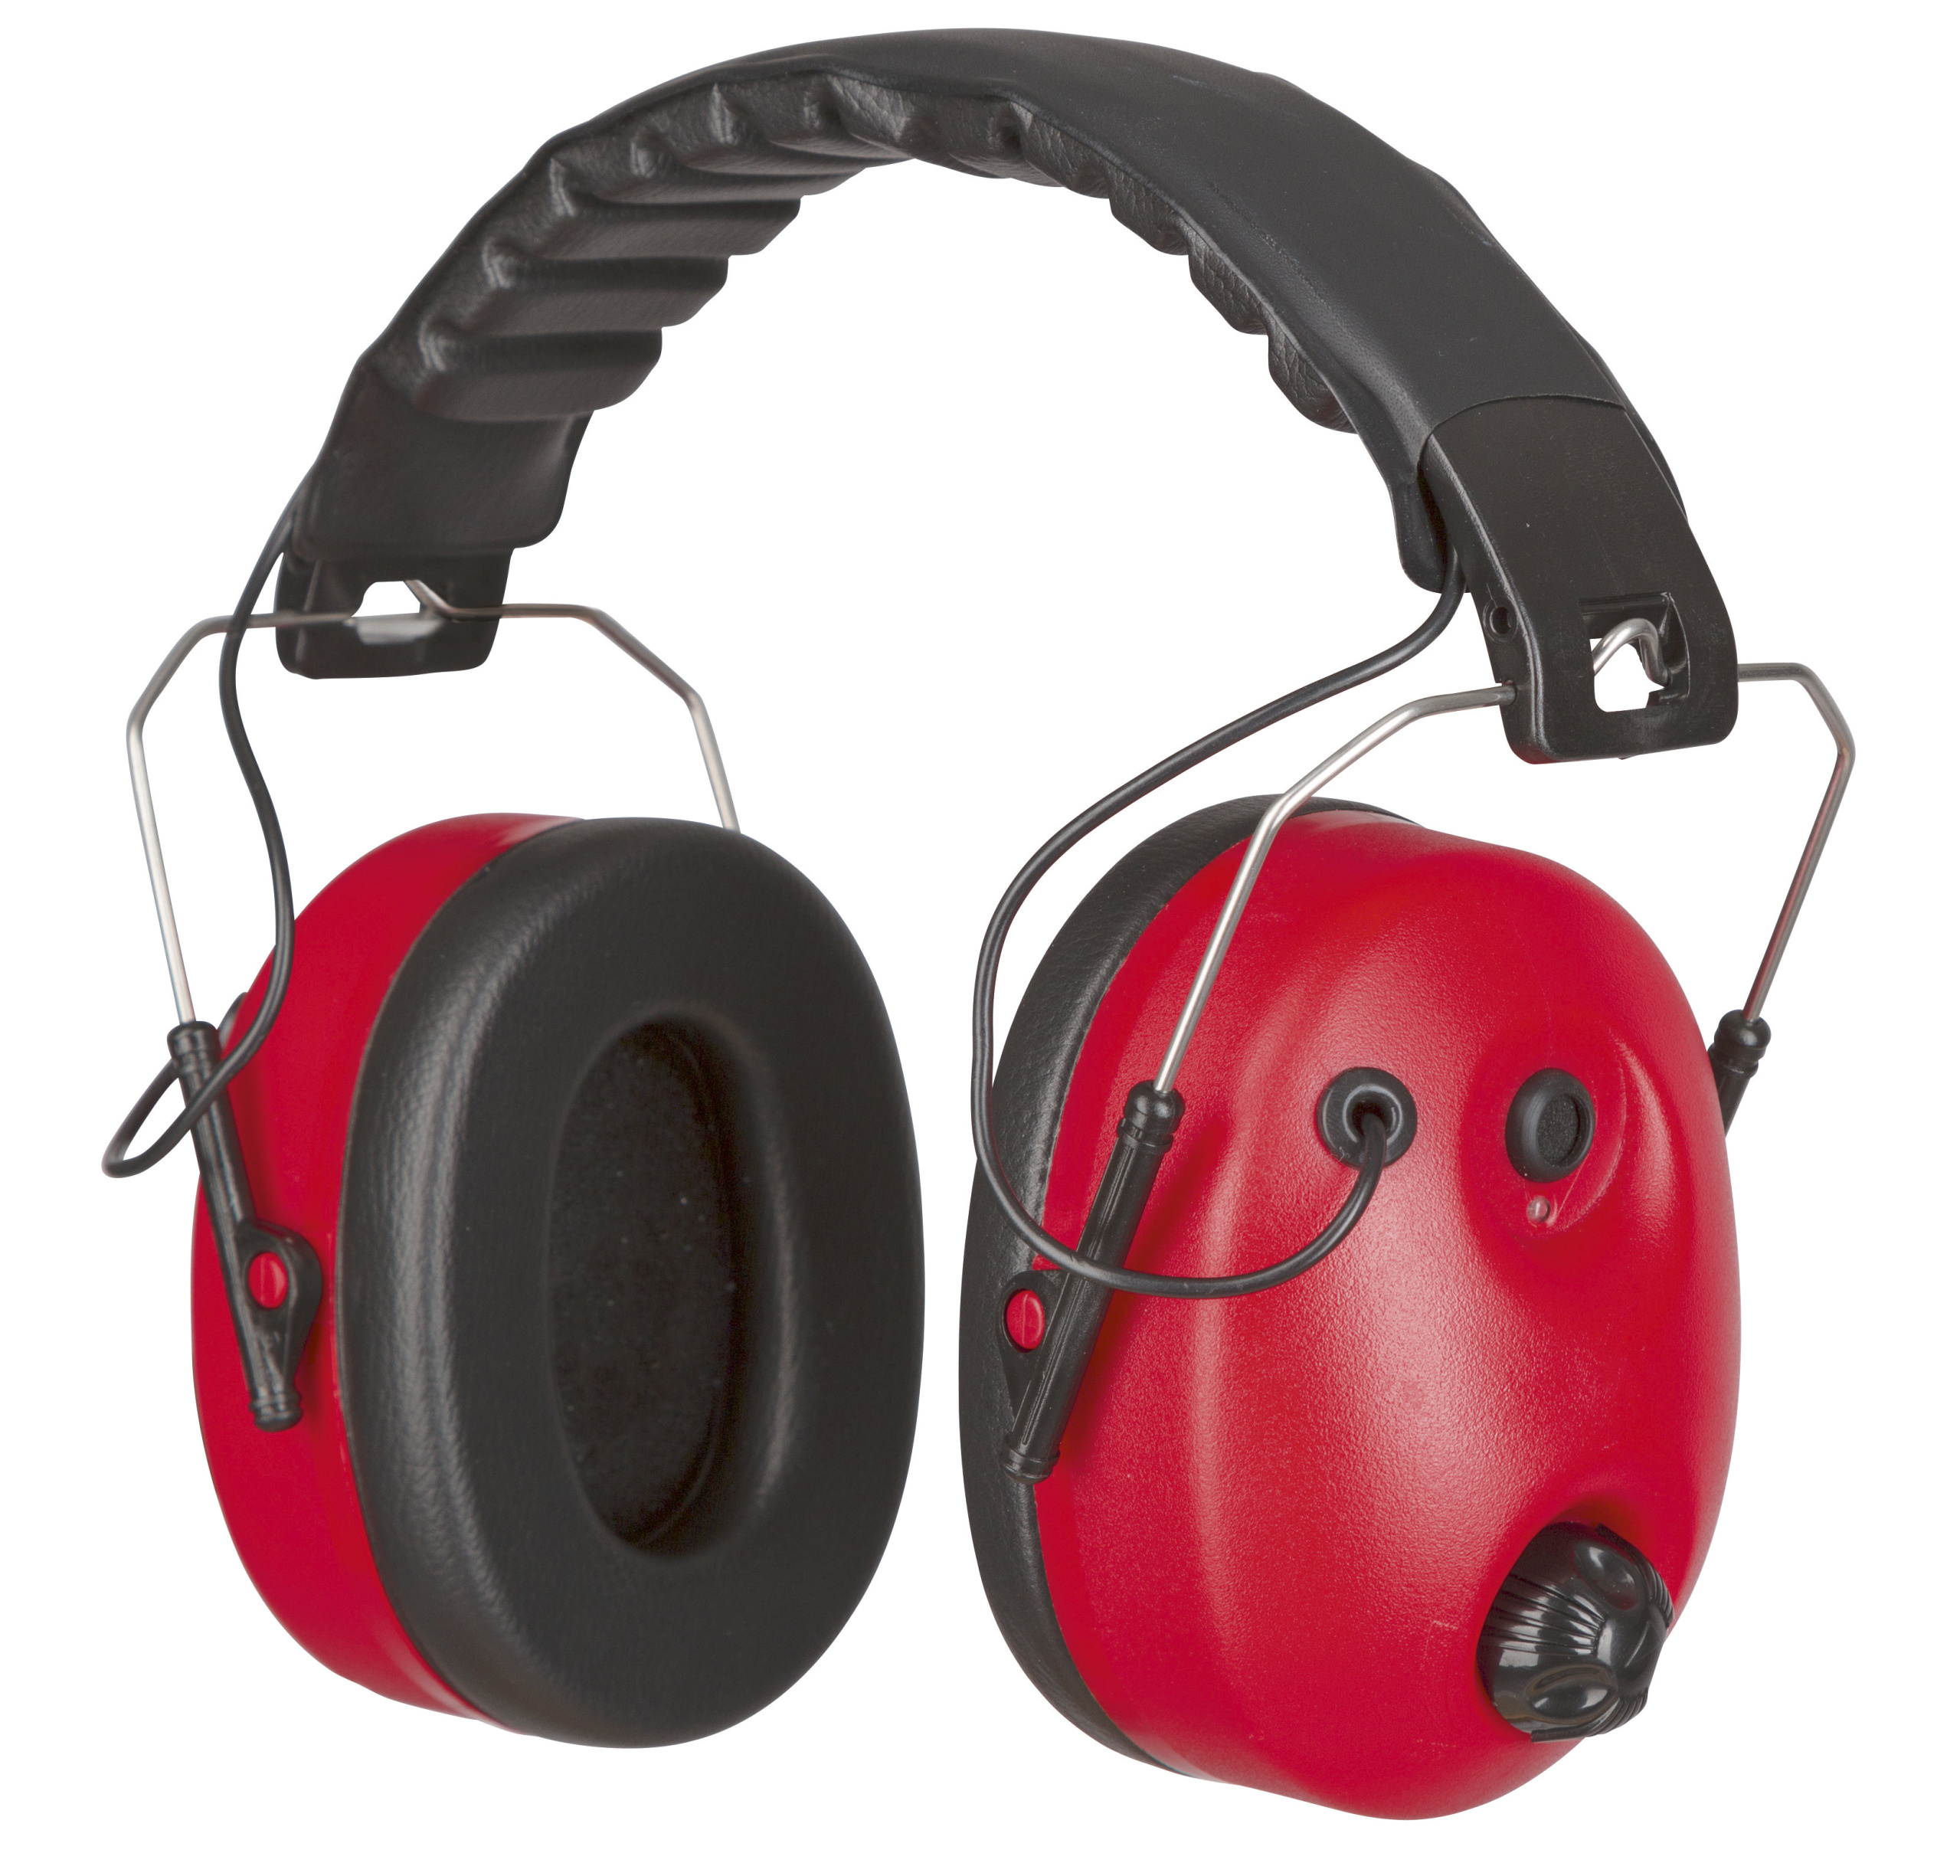 Gehörschutz pegelabhängig Schallbegrenzung=82dB SNR=31dB